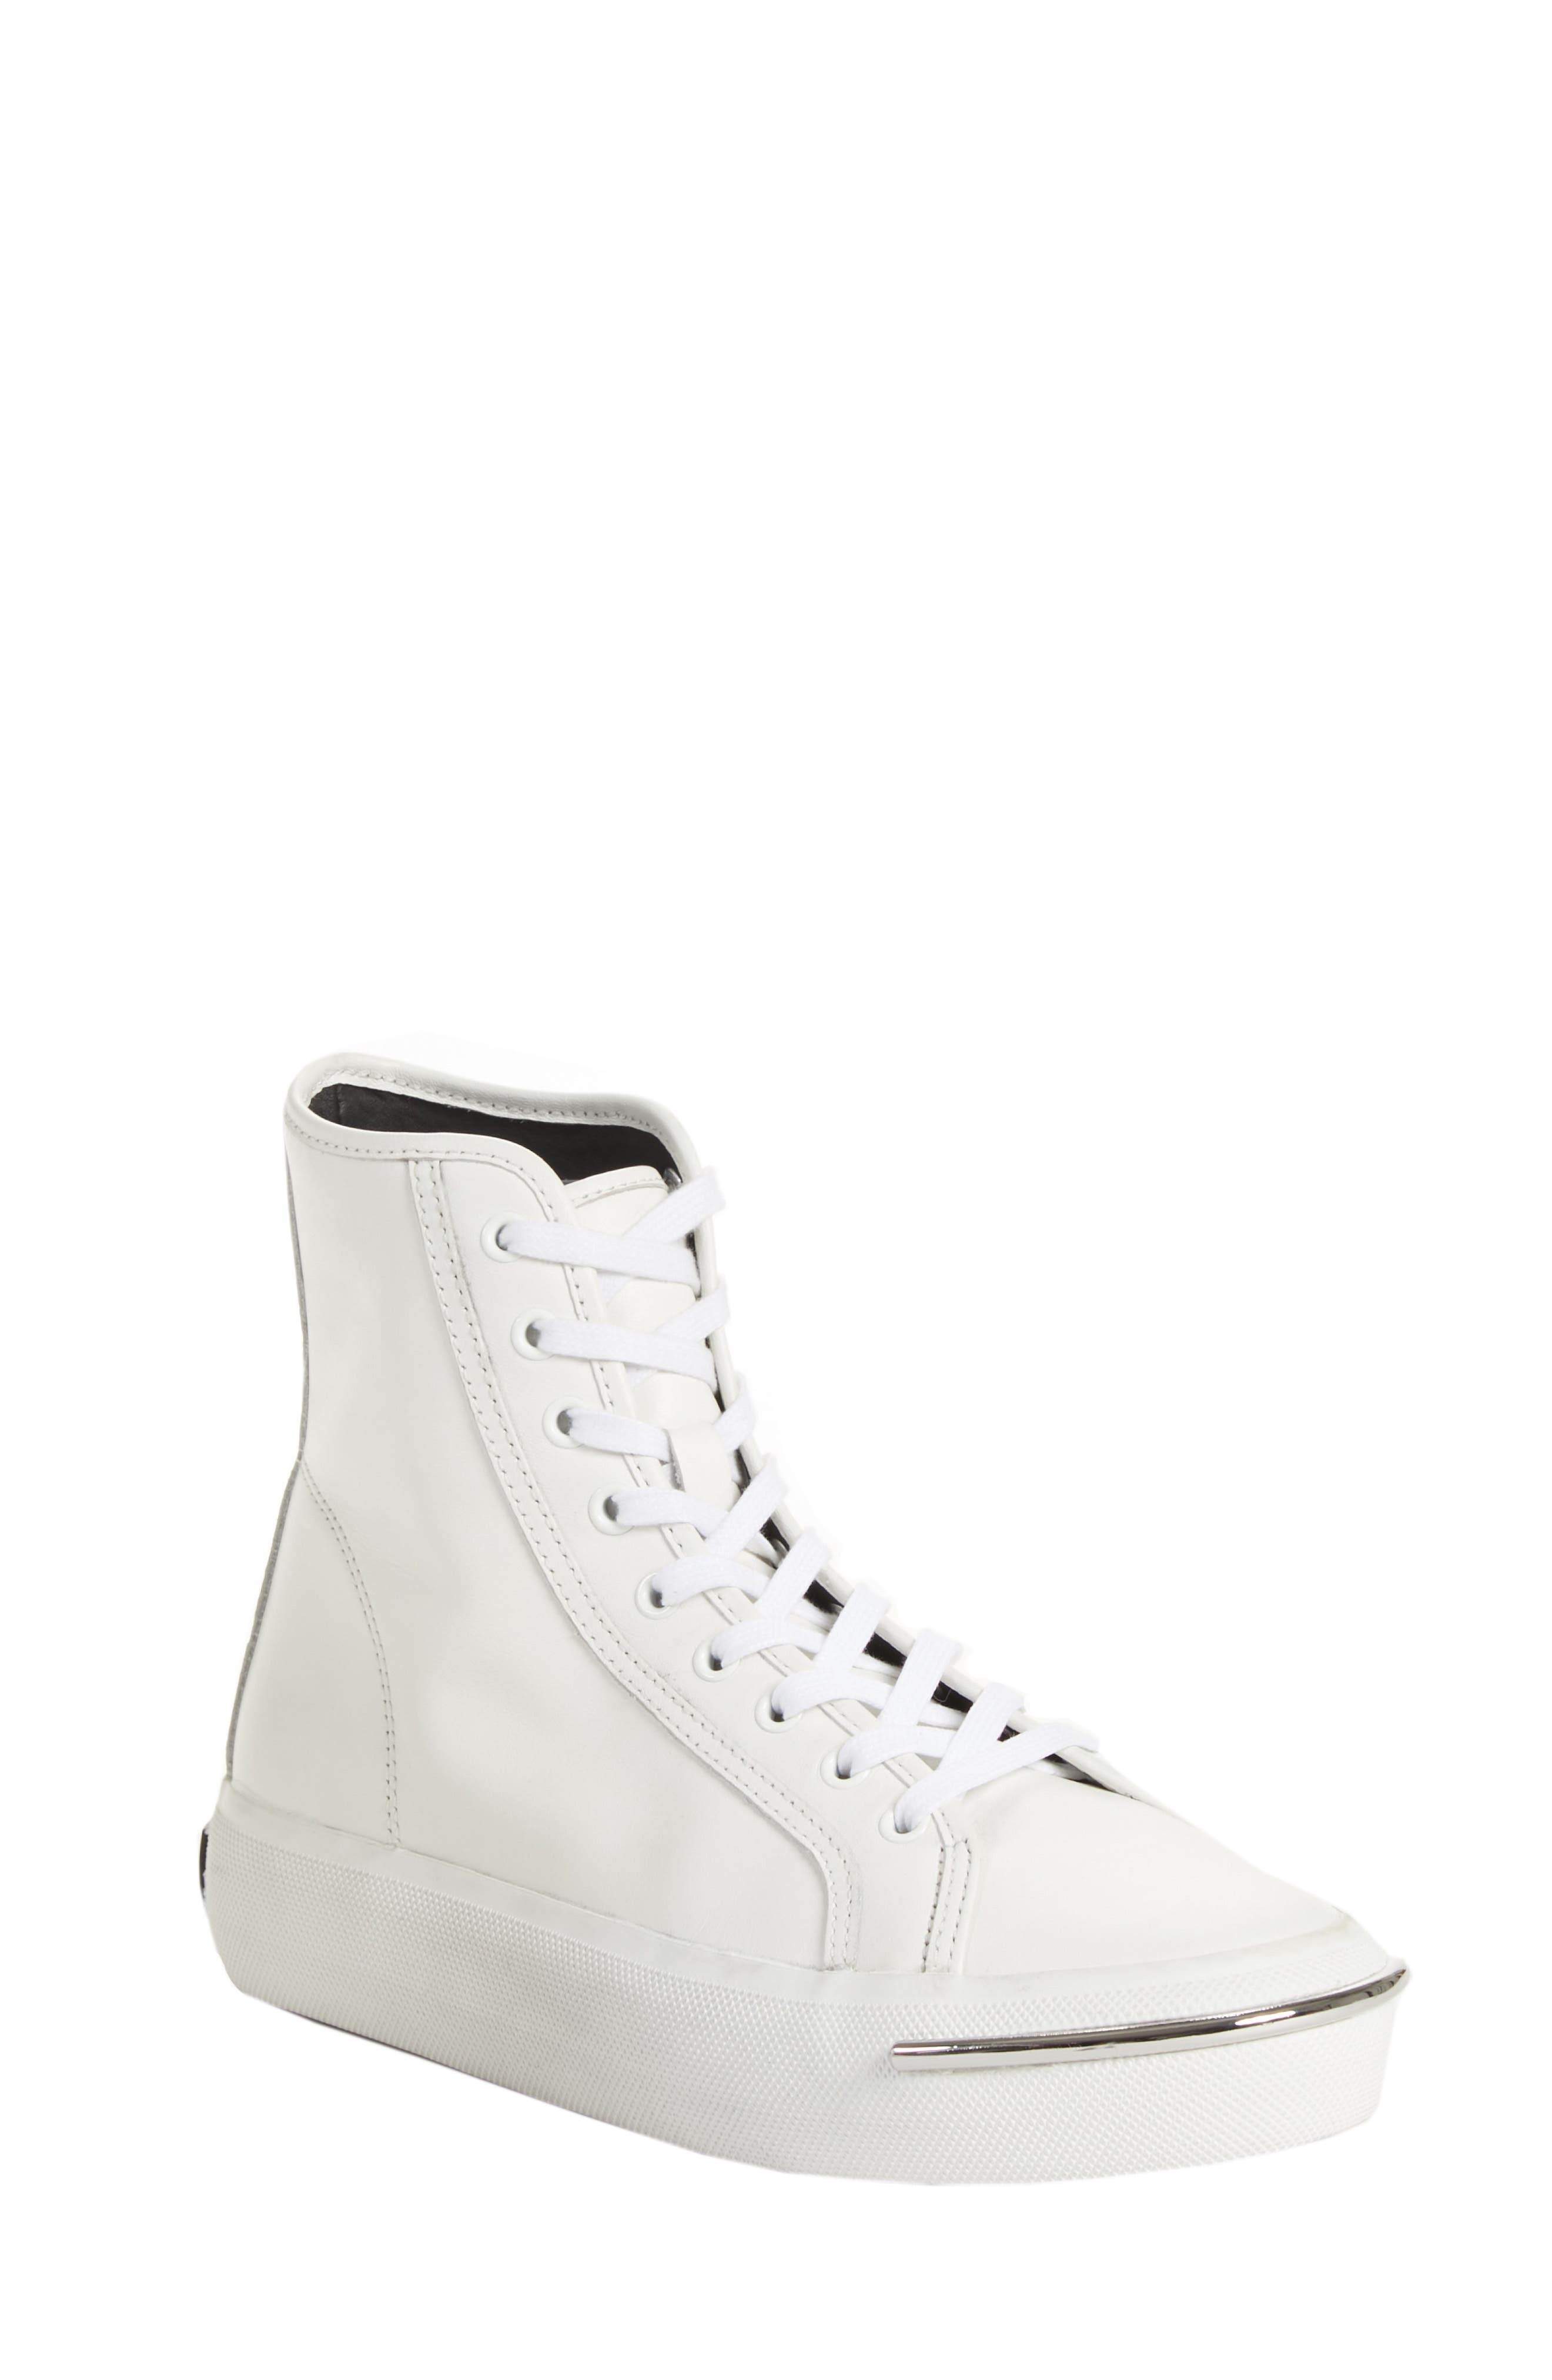 Alexander Wang Pia High Top Sneaker, White